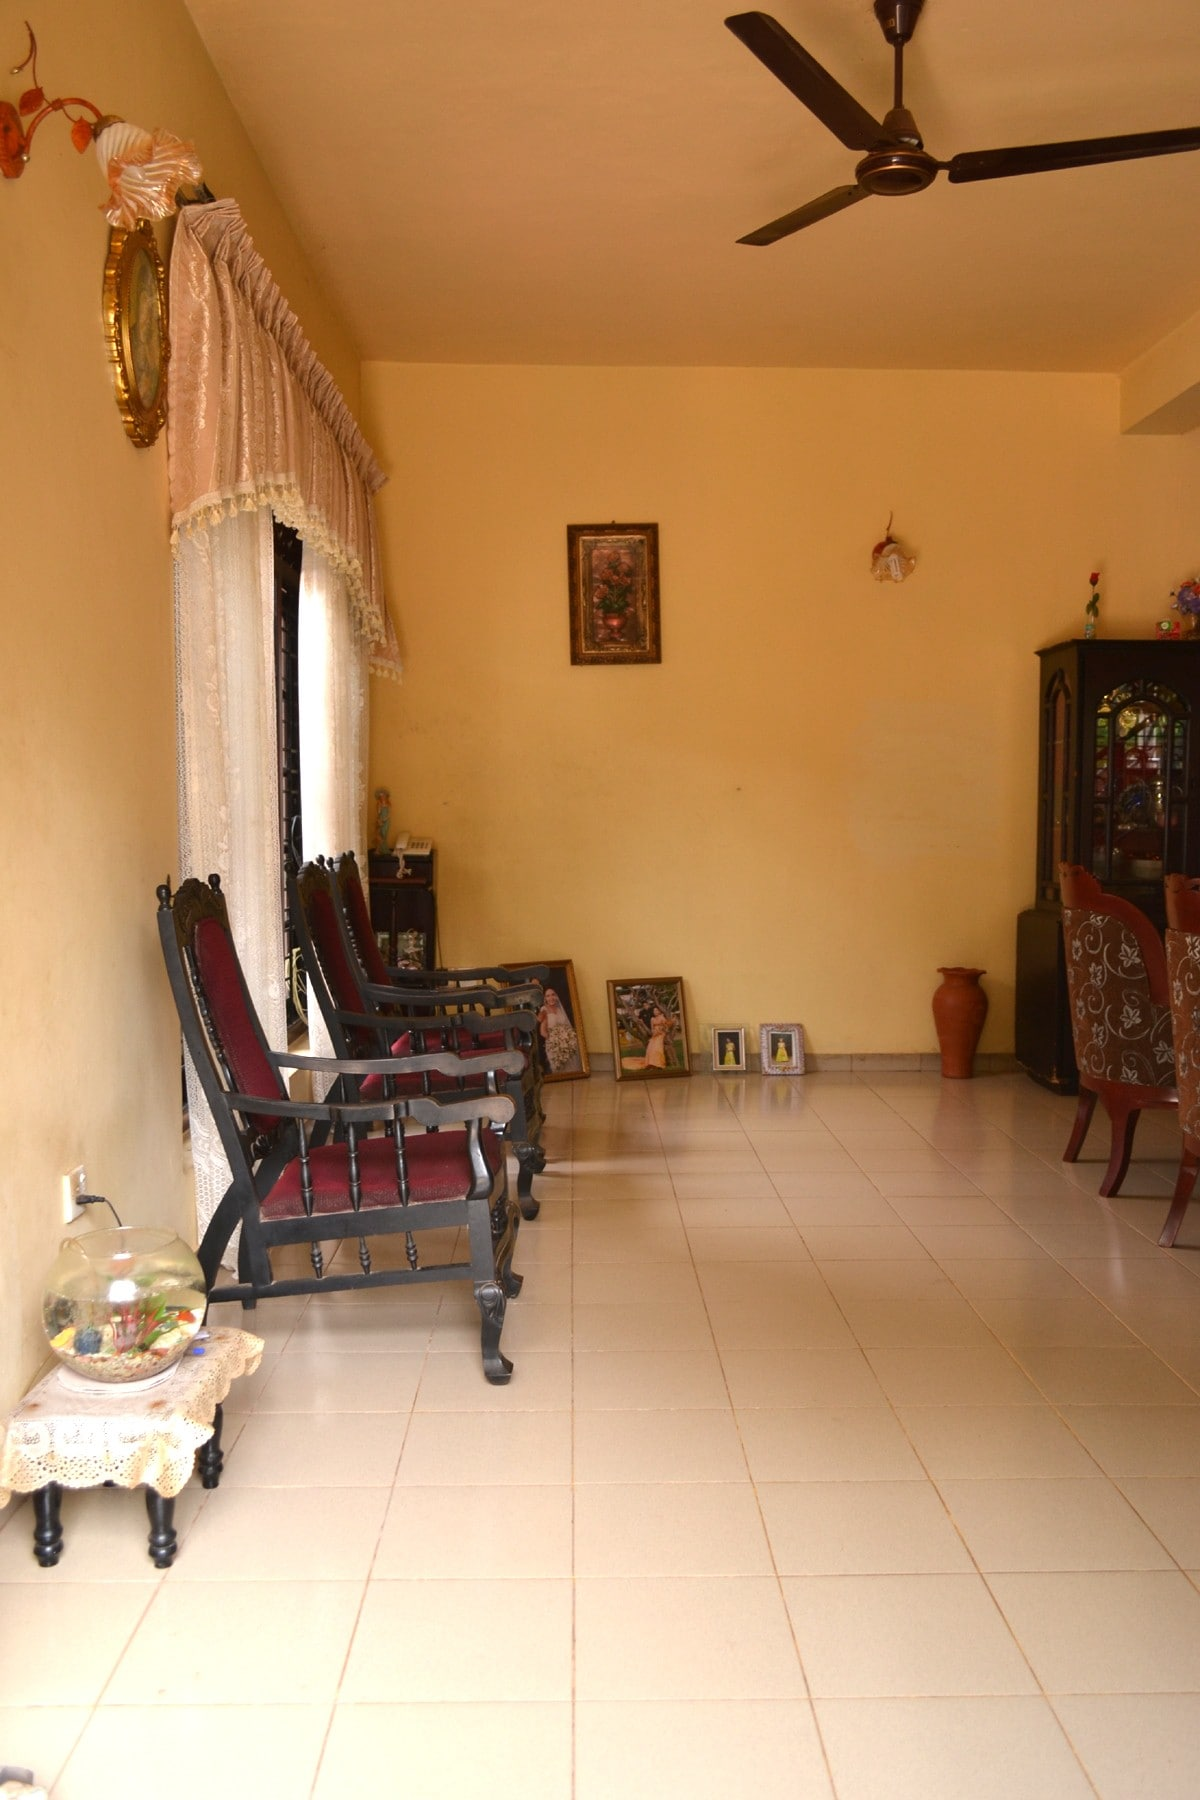 Welcome To Randi Homestay In Negombo Srilanka